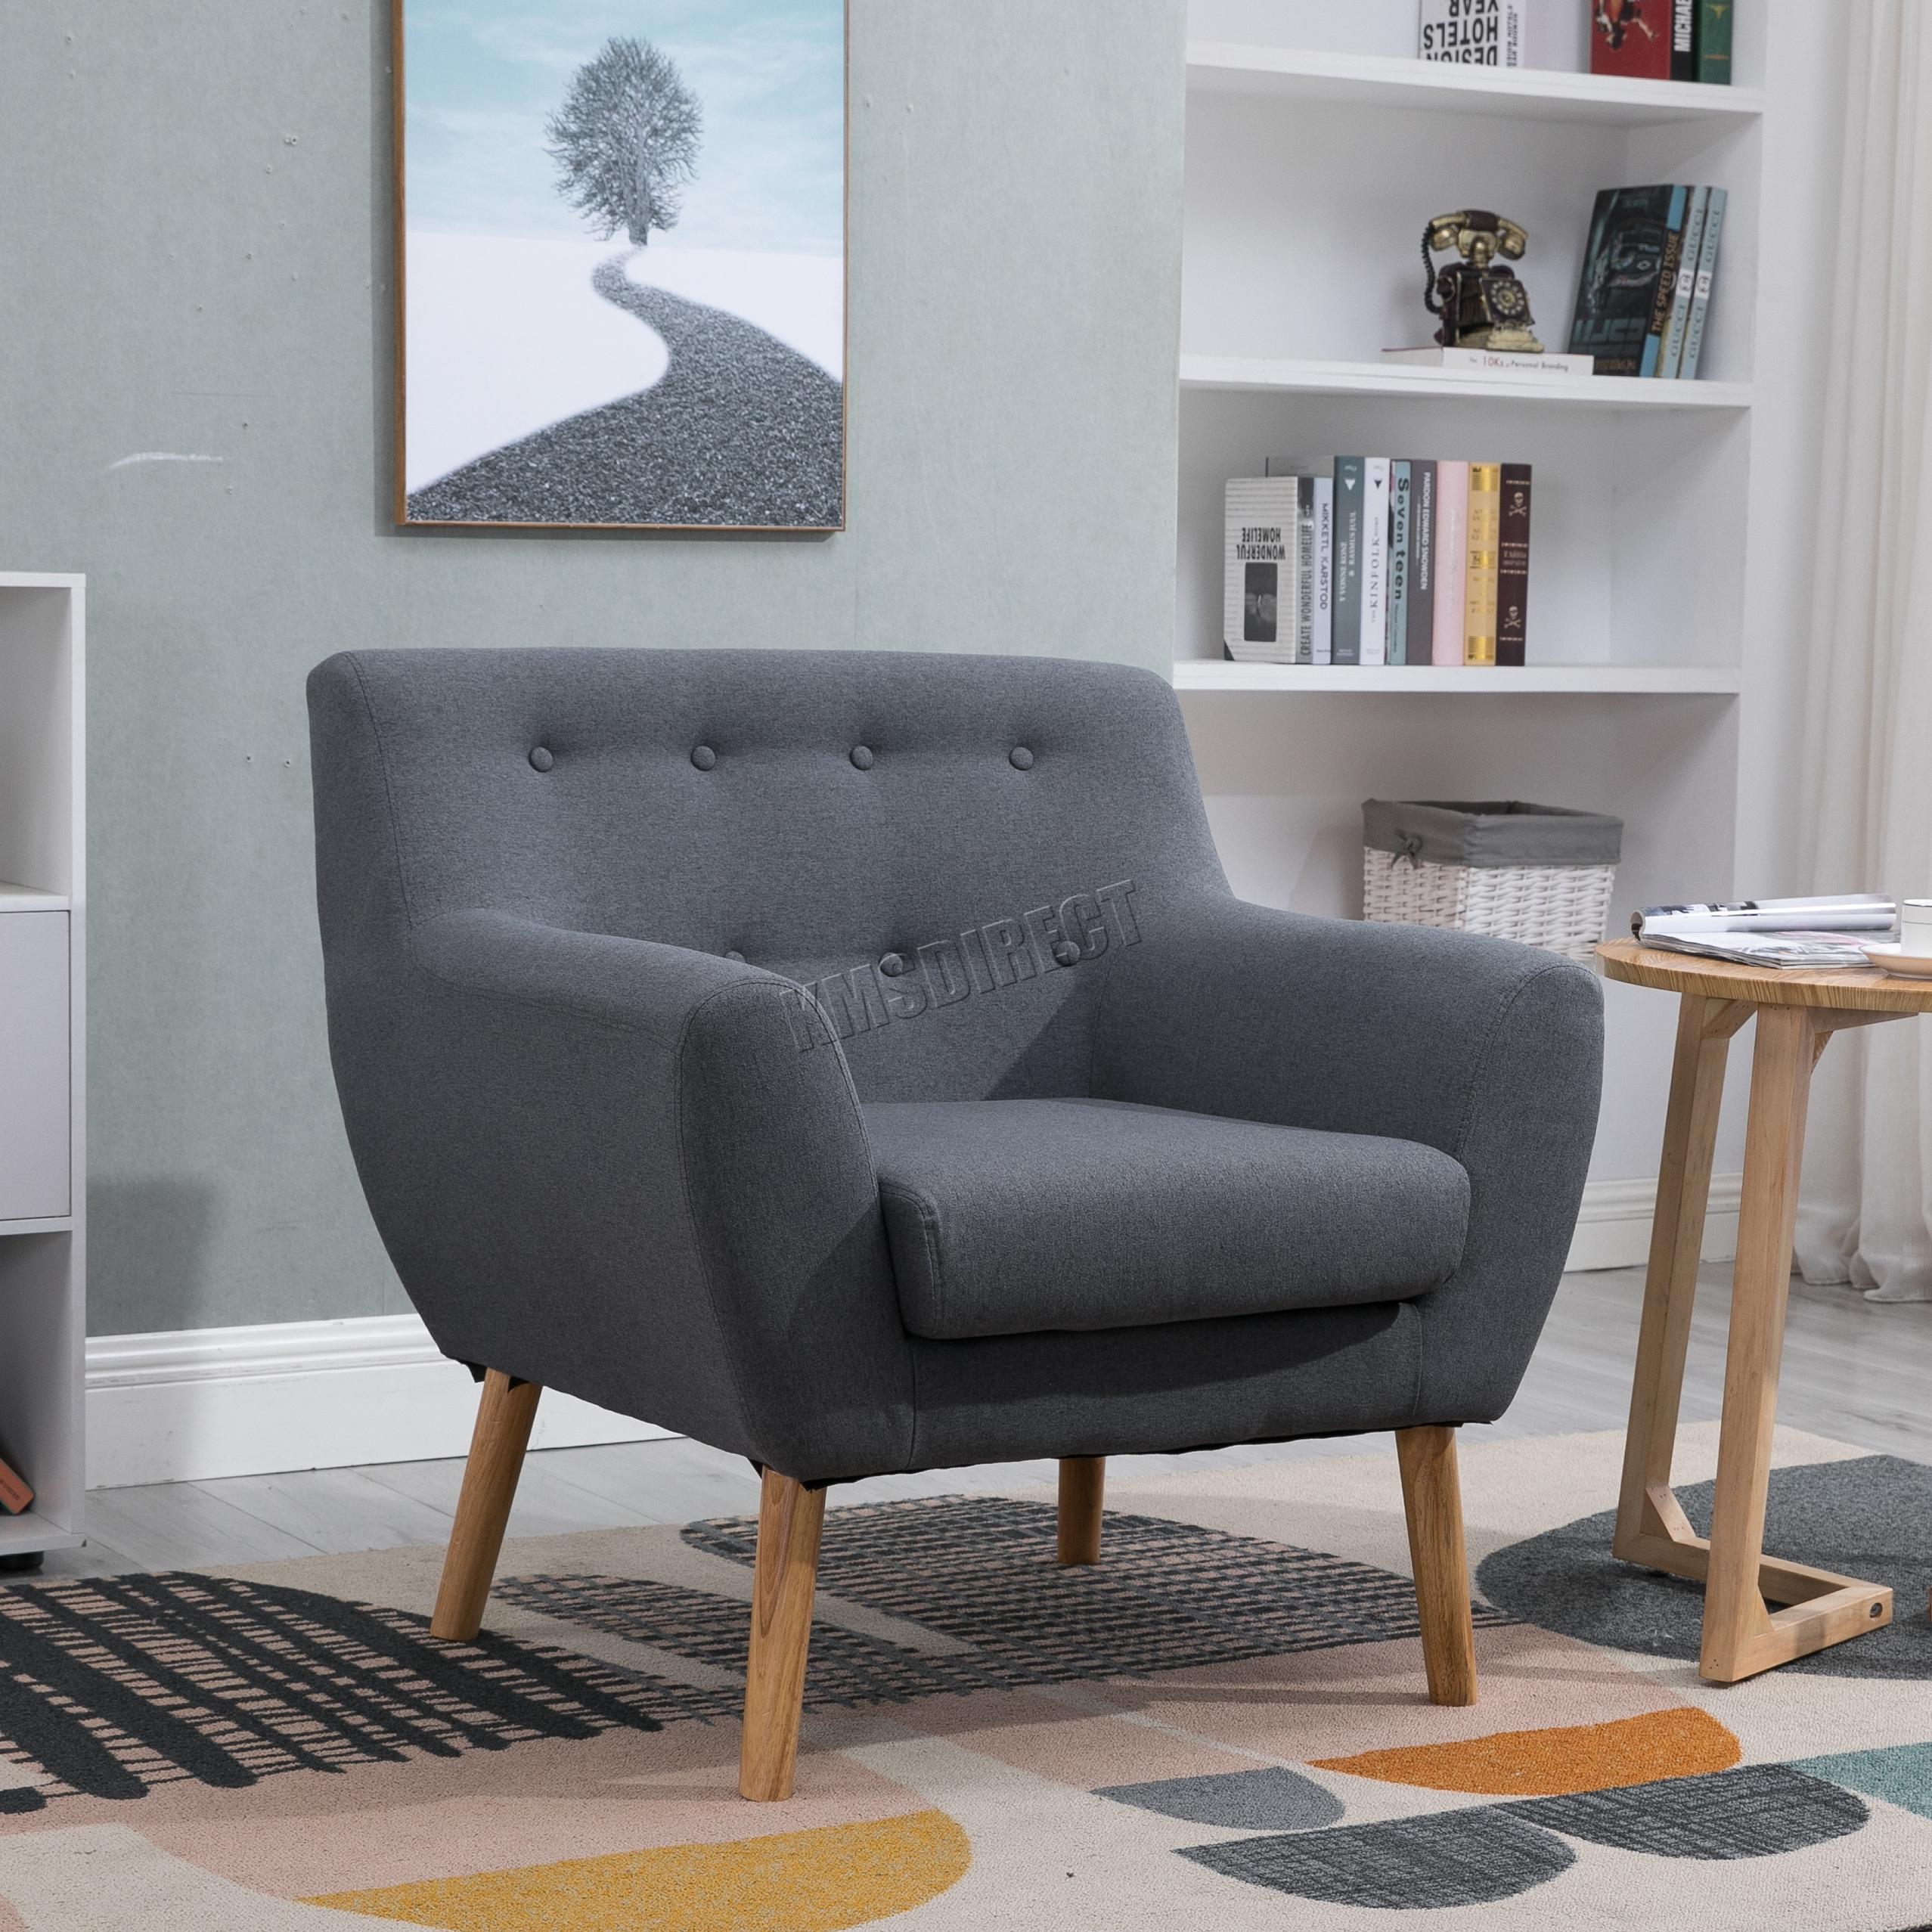 Grey Armchair Uk Ebay DimensionsGrey Chair Armchair Wing Back Fireside Duke